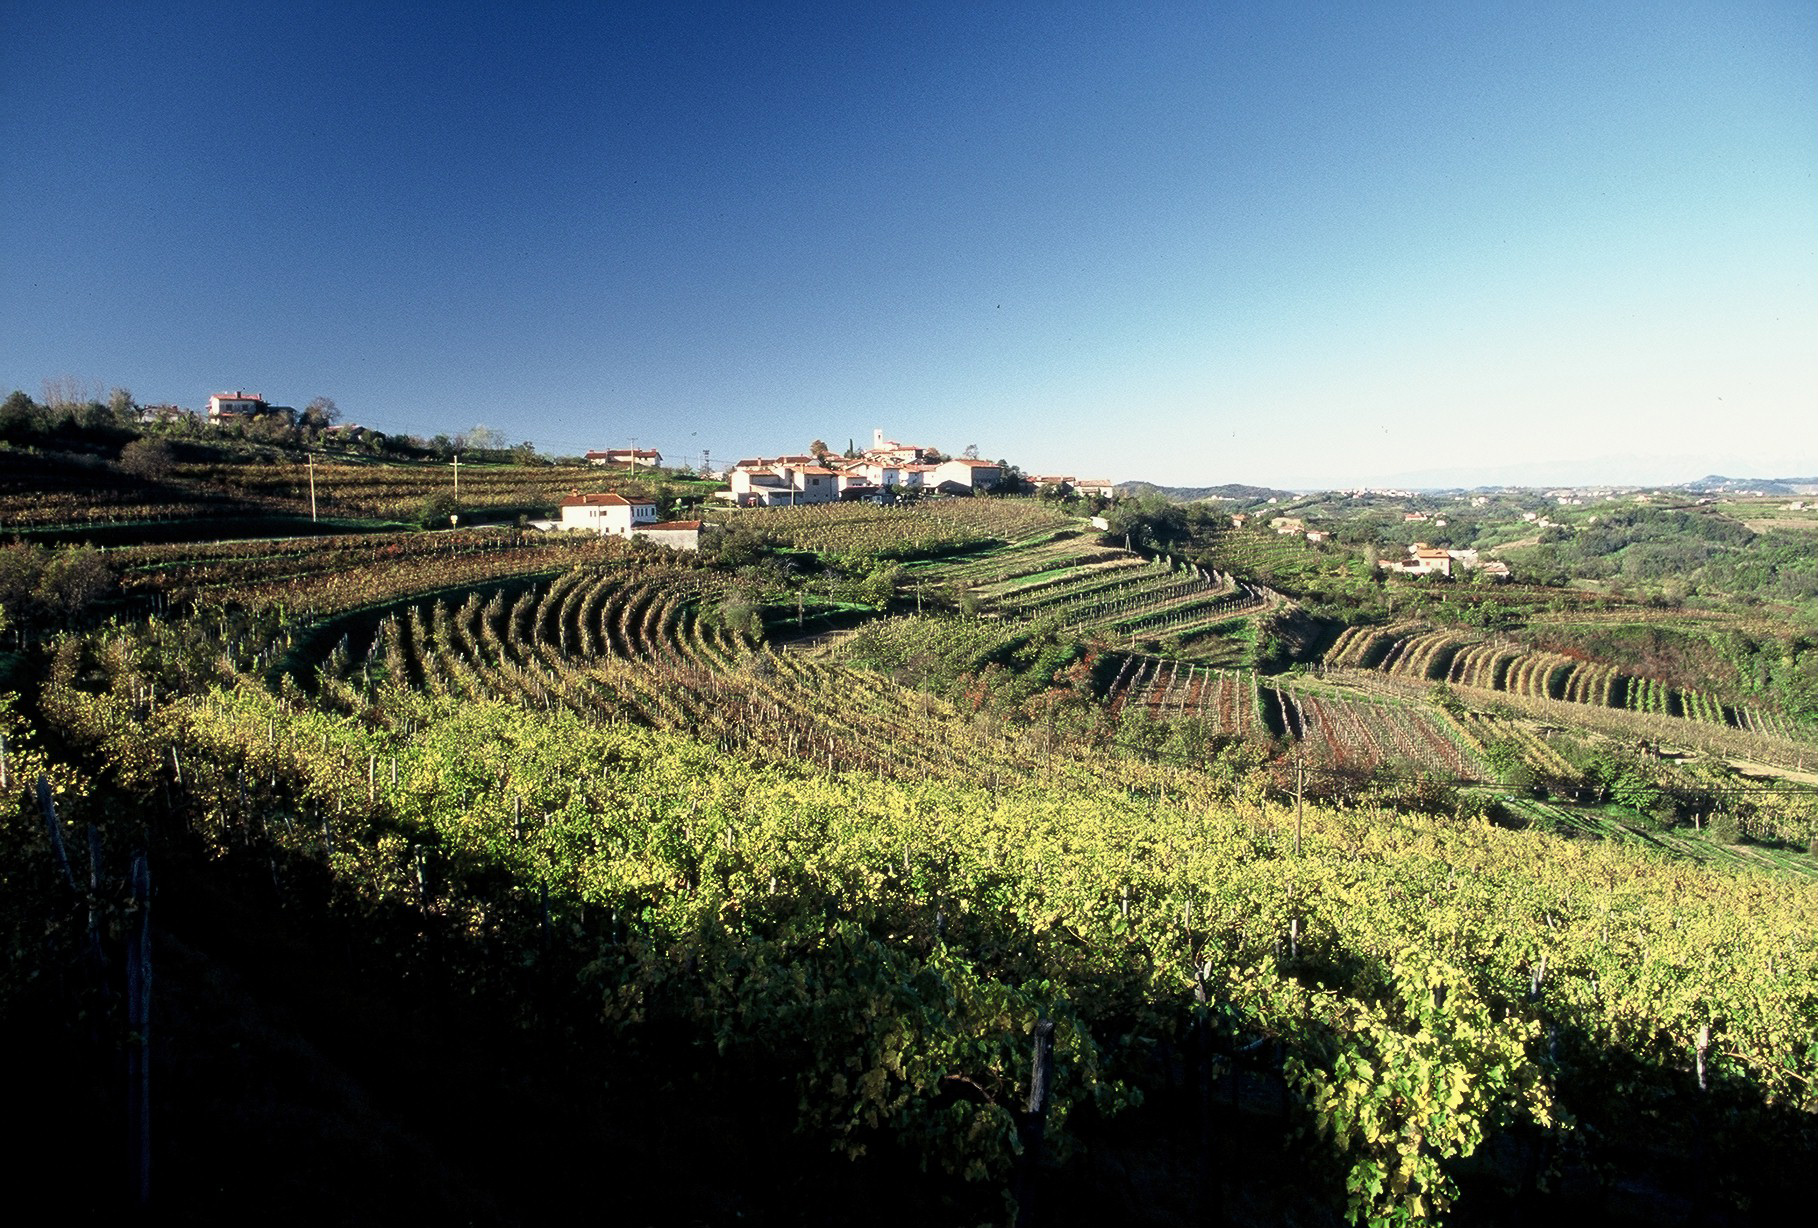 Marjan Simcic Vineyards | Photo Credit: Chris Boiling